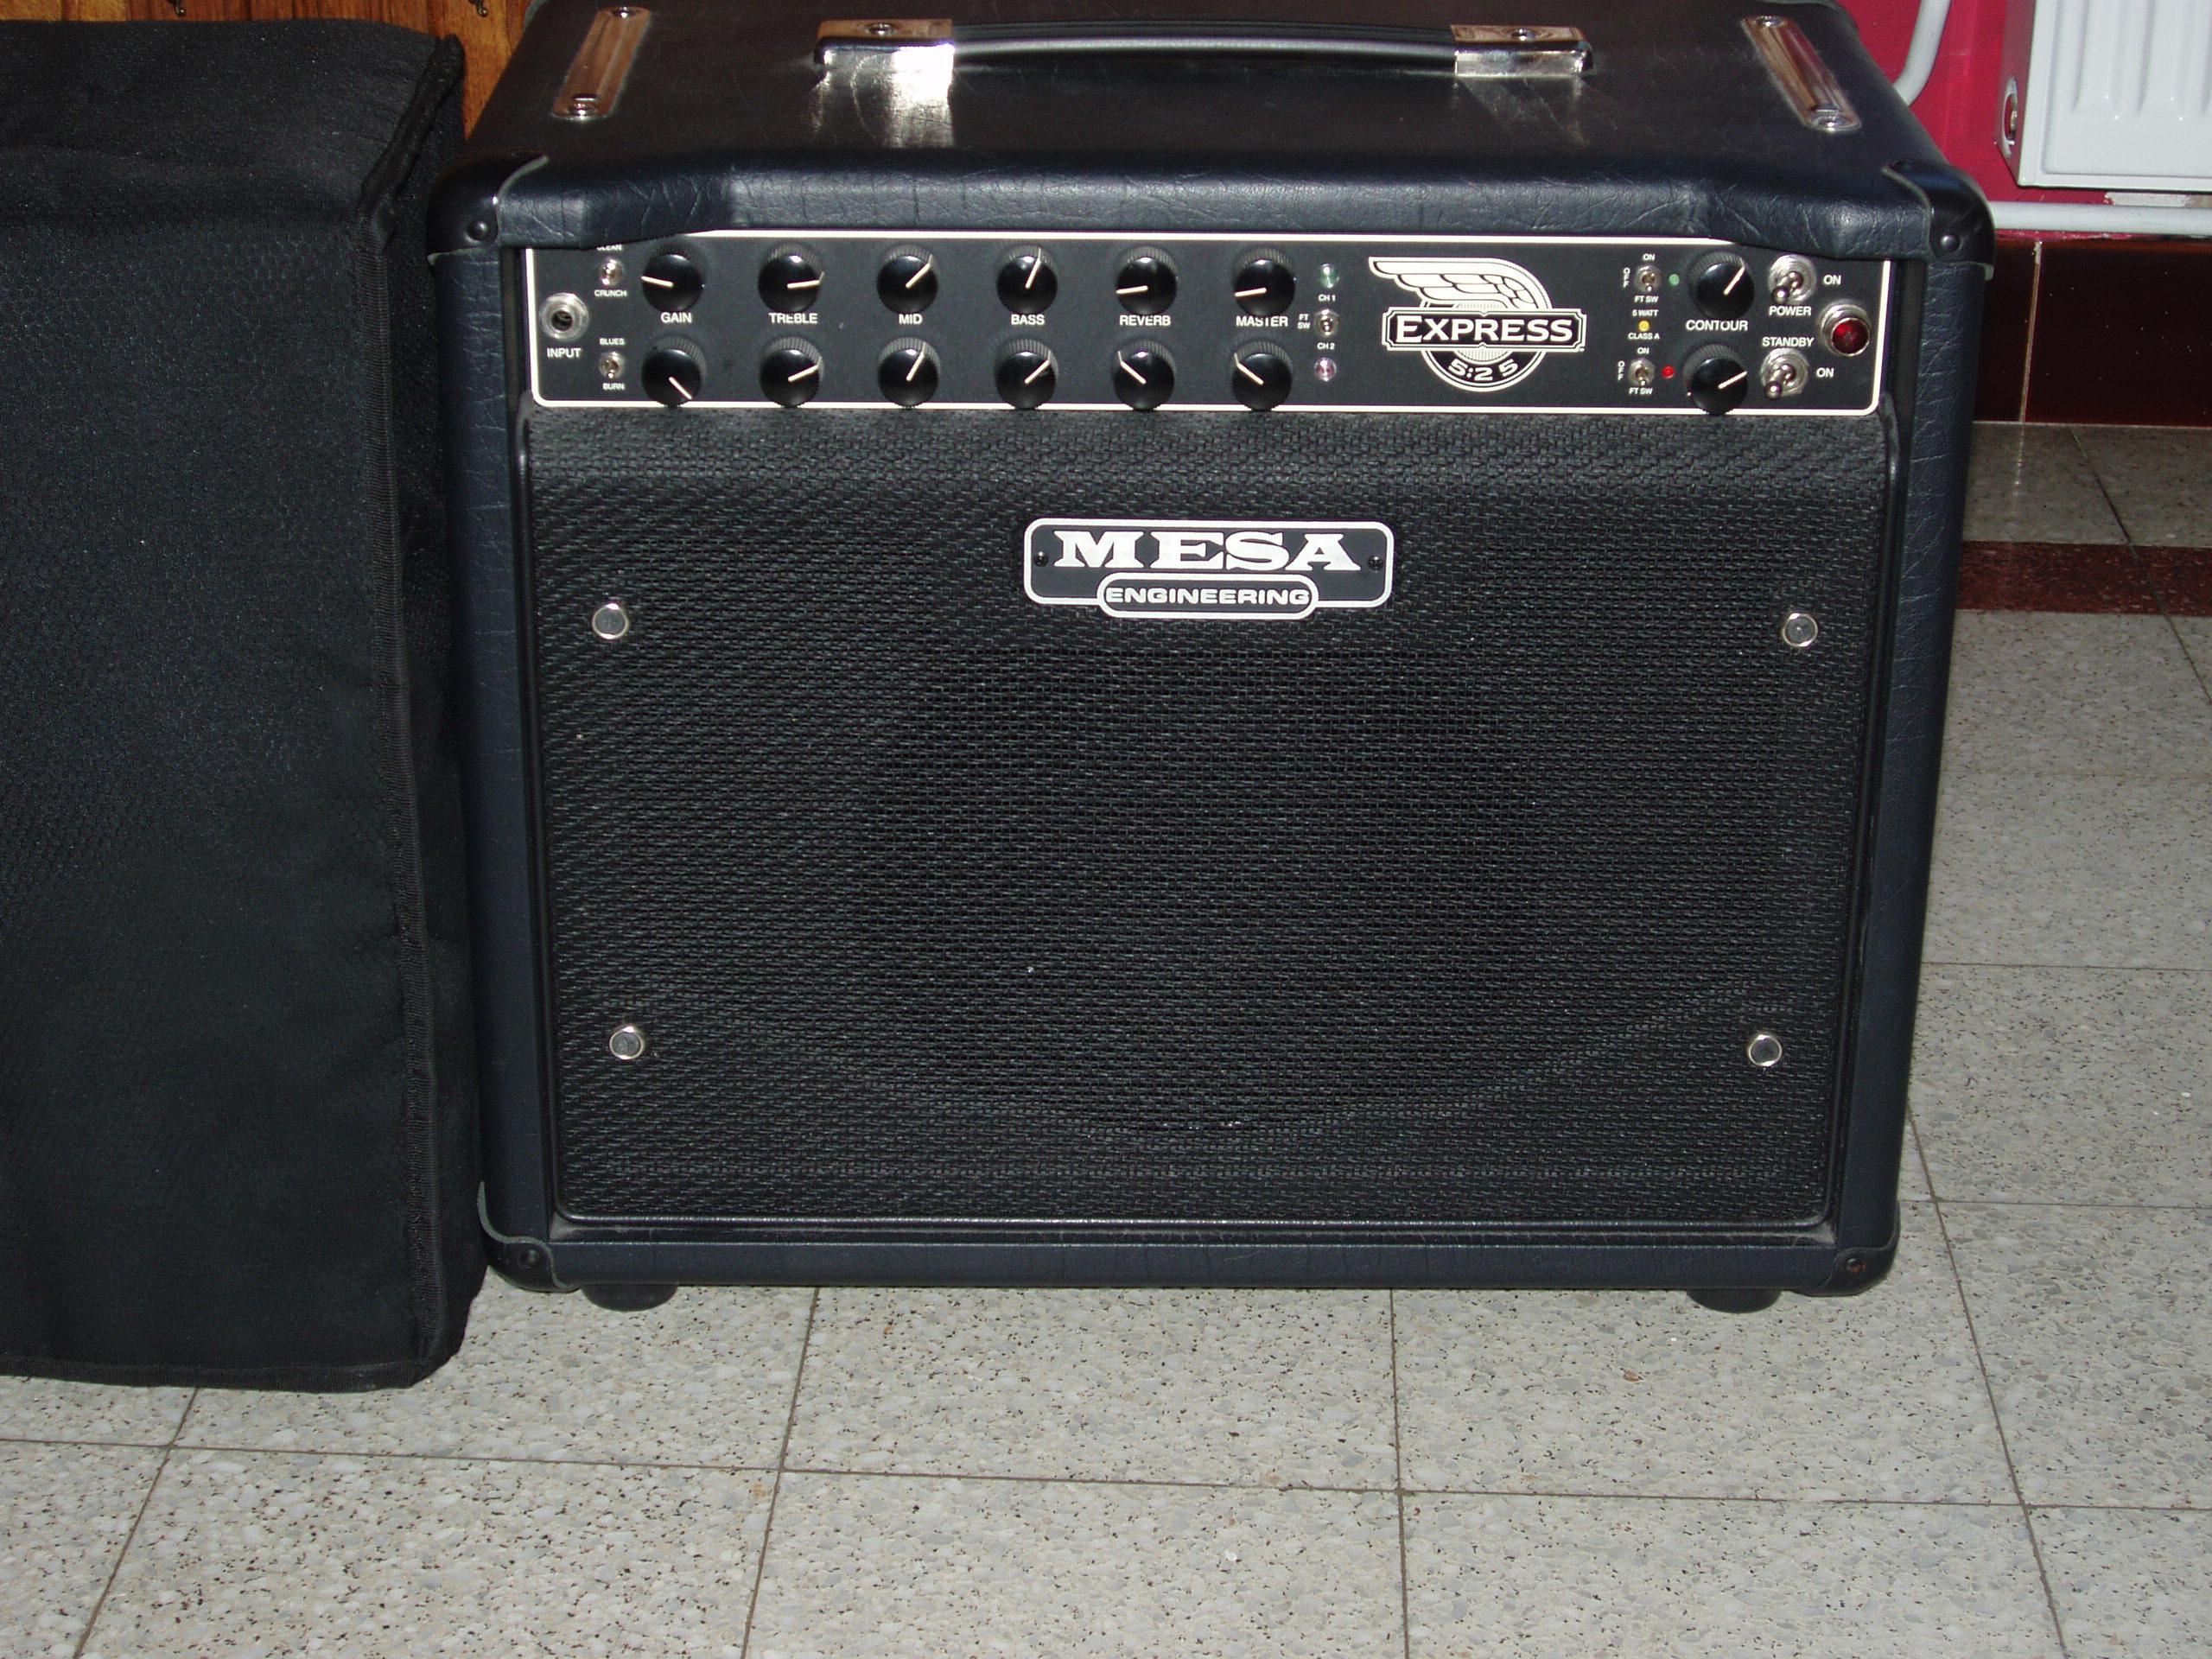 Mesa boogie express 5 25 1x10 combo image 372054 for Mesa boogie express 5 25